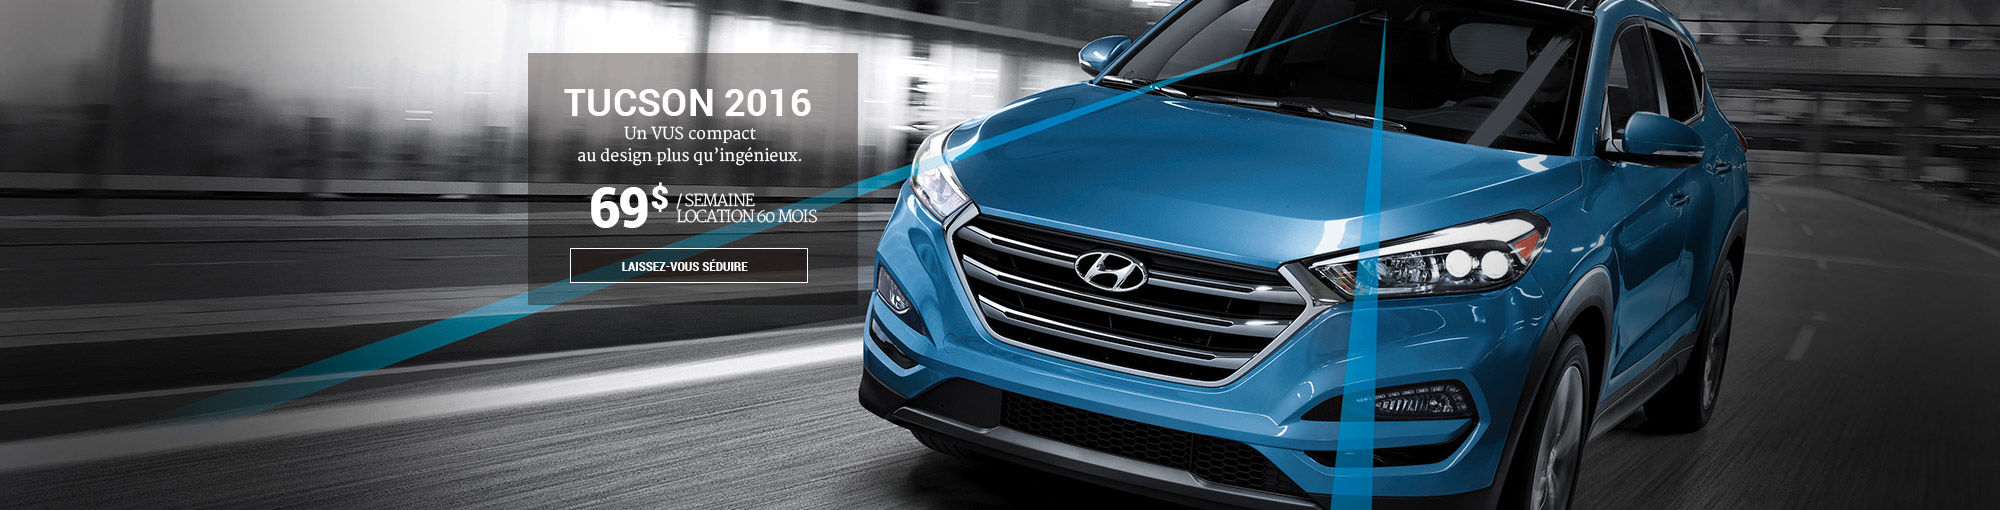 Hyundai Tucson 2016 header - juillet 2016 HSH